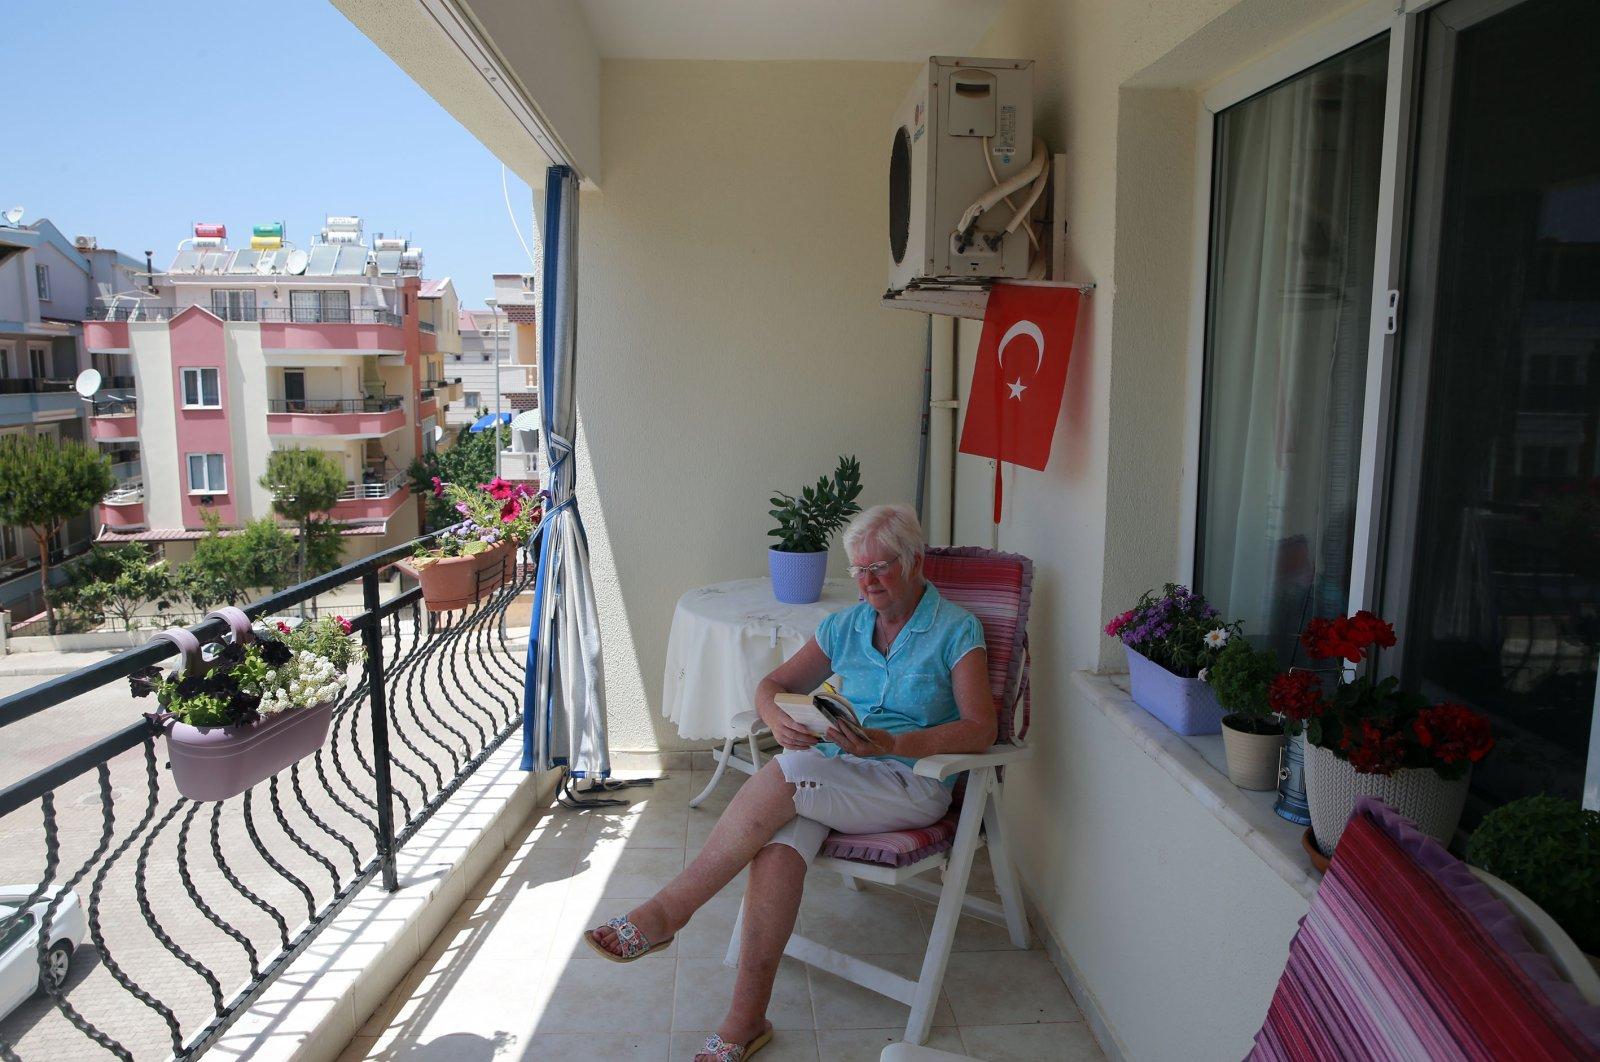 British expat Helene McGowan reads a book on her house's balcony, in Didim, Aydın, western Turkey, June 6, 2021. (AA PHOTO)